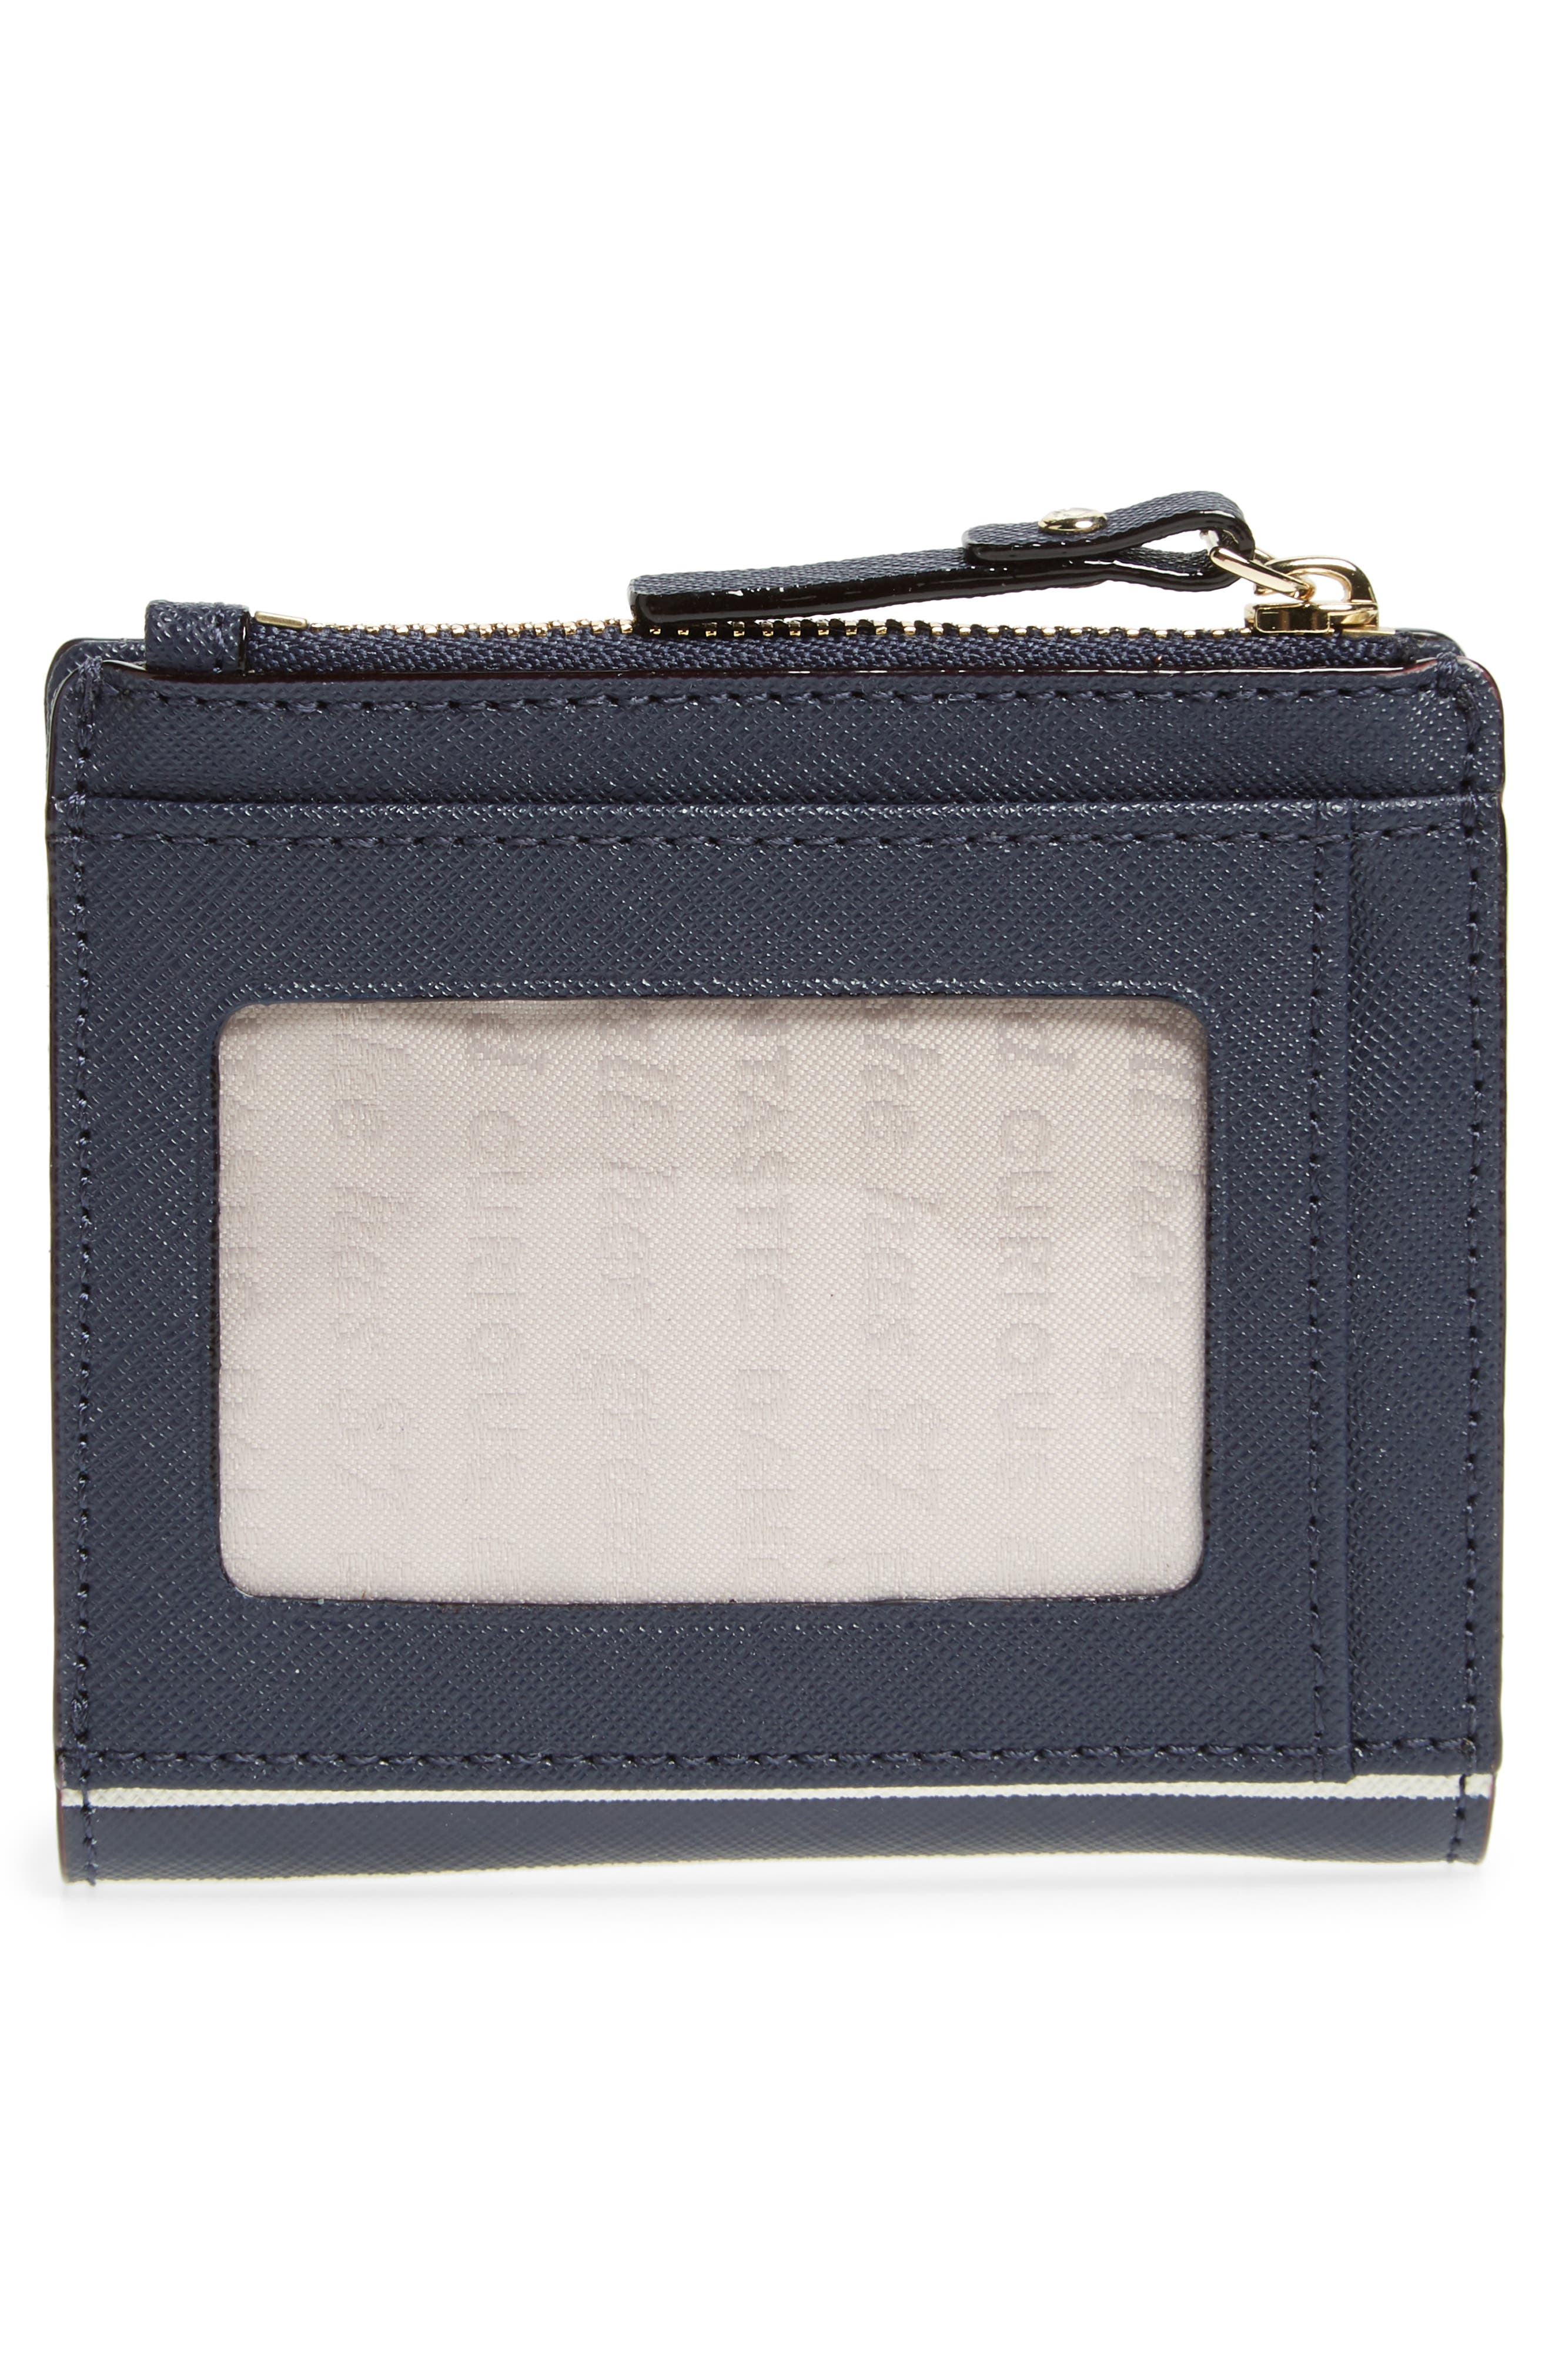 shore thing - stripe adalyn leather wallet,                             Alternate thumbnail 4, color,                             Multi